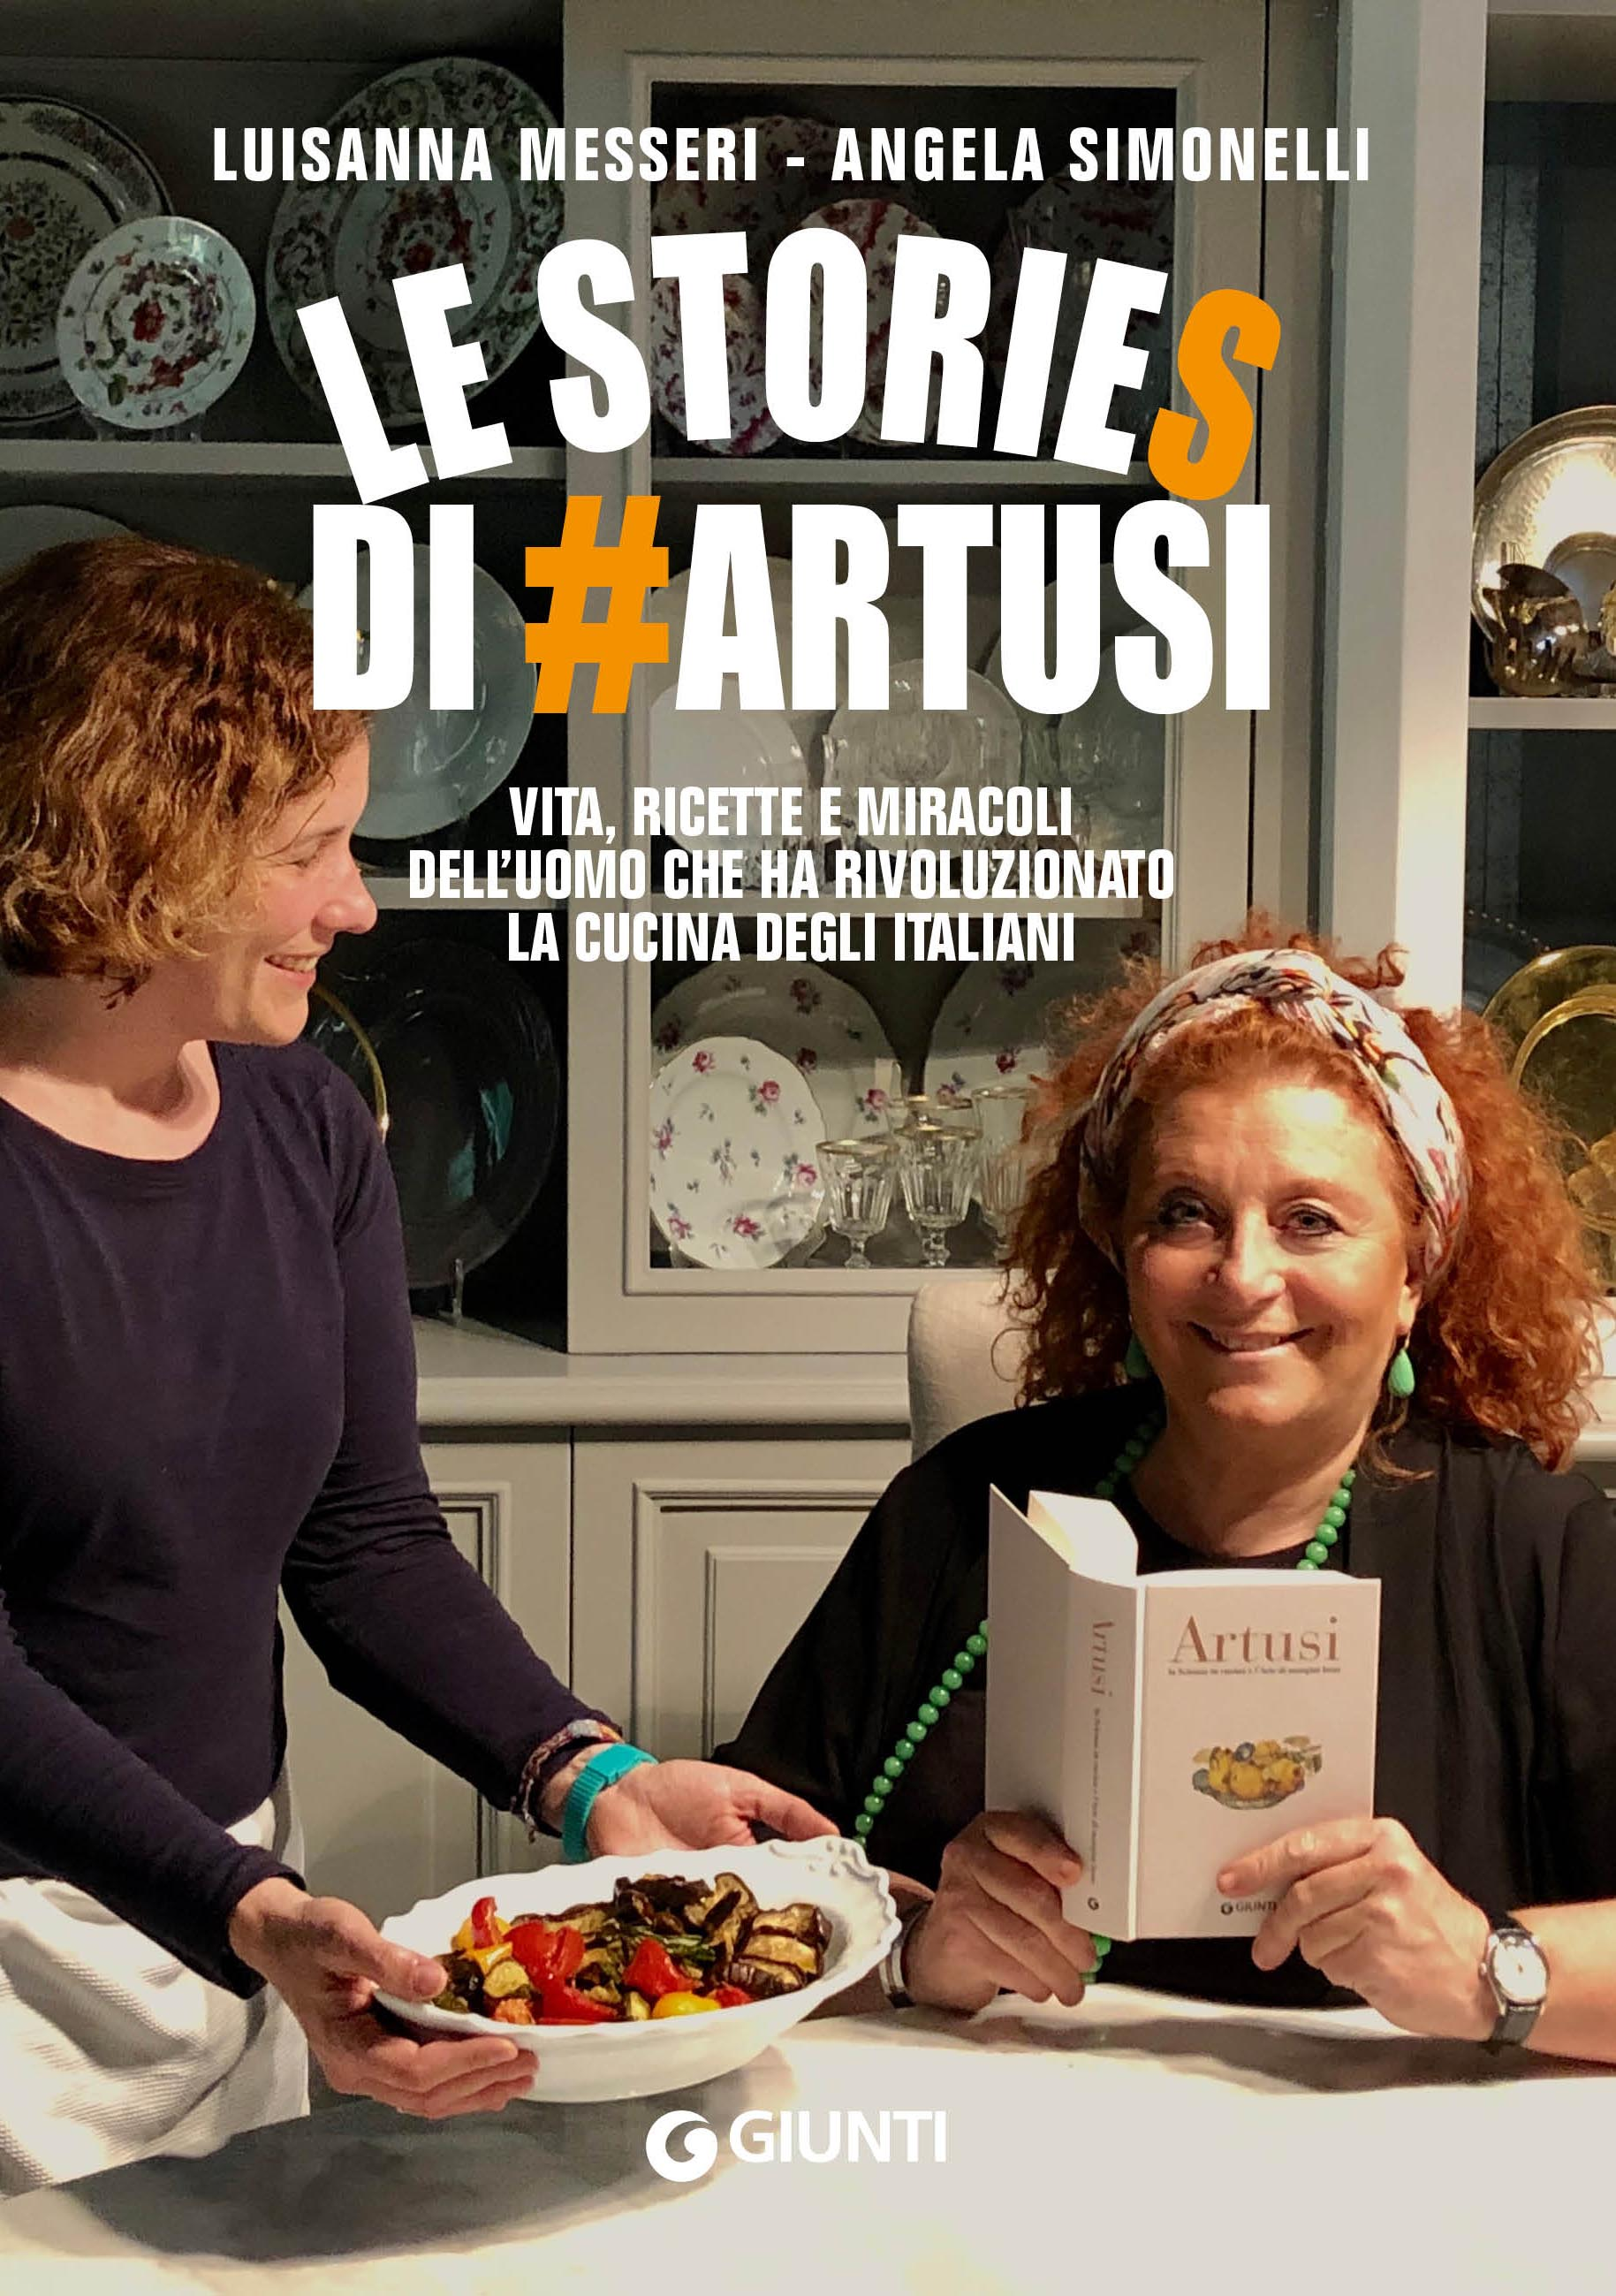 Le stories di #Artusi